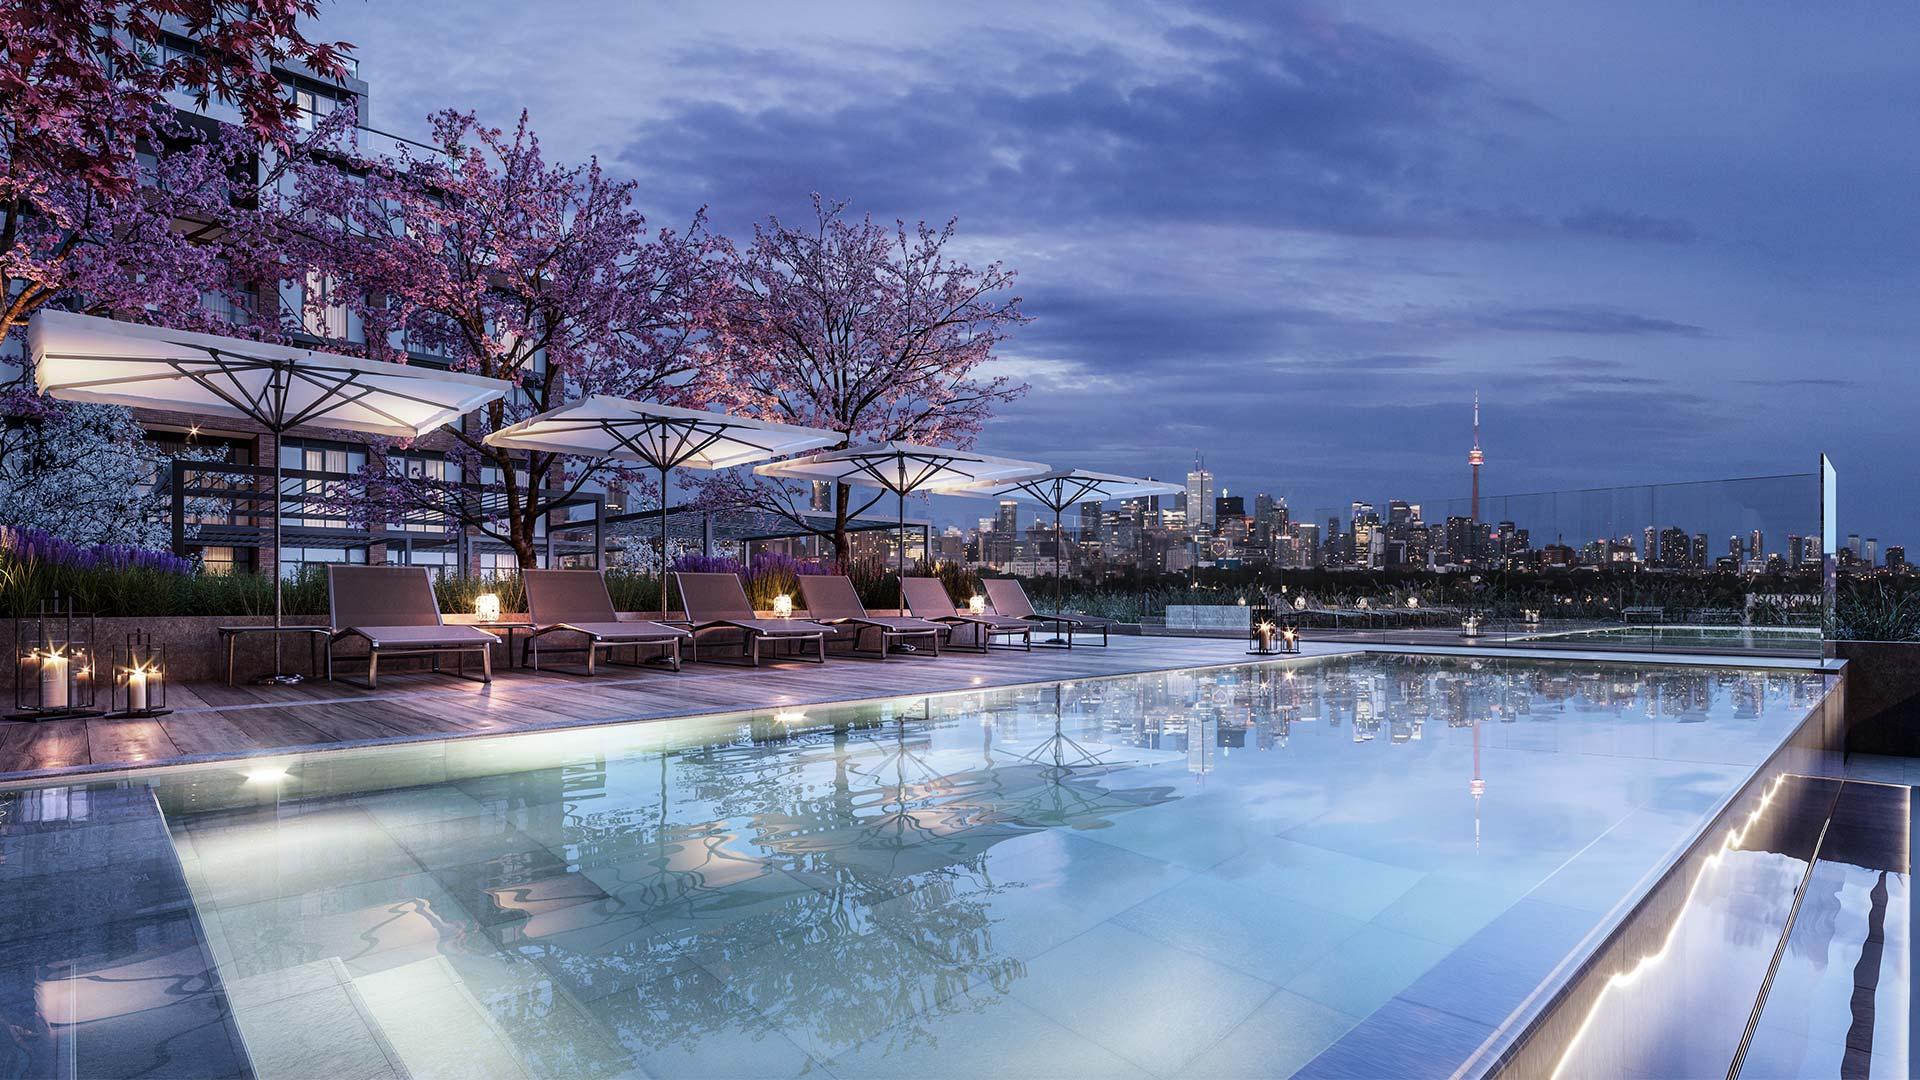 Outdoor pool overlooking Toronto skyline